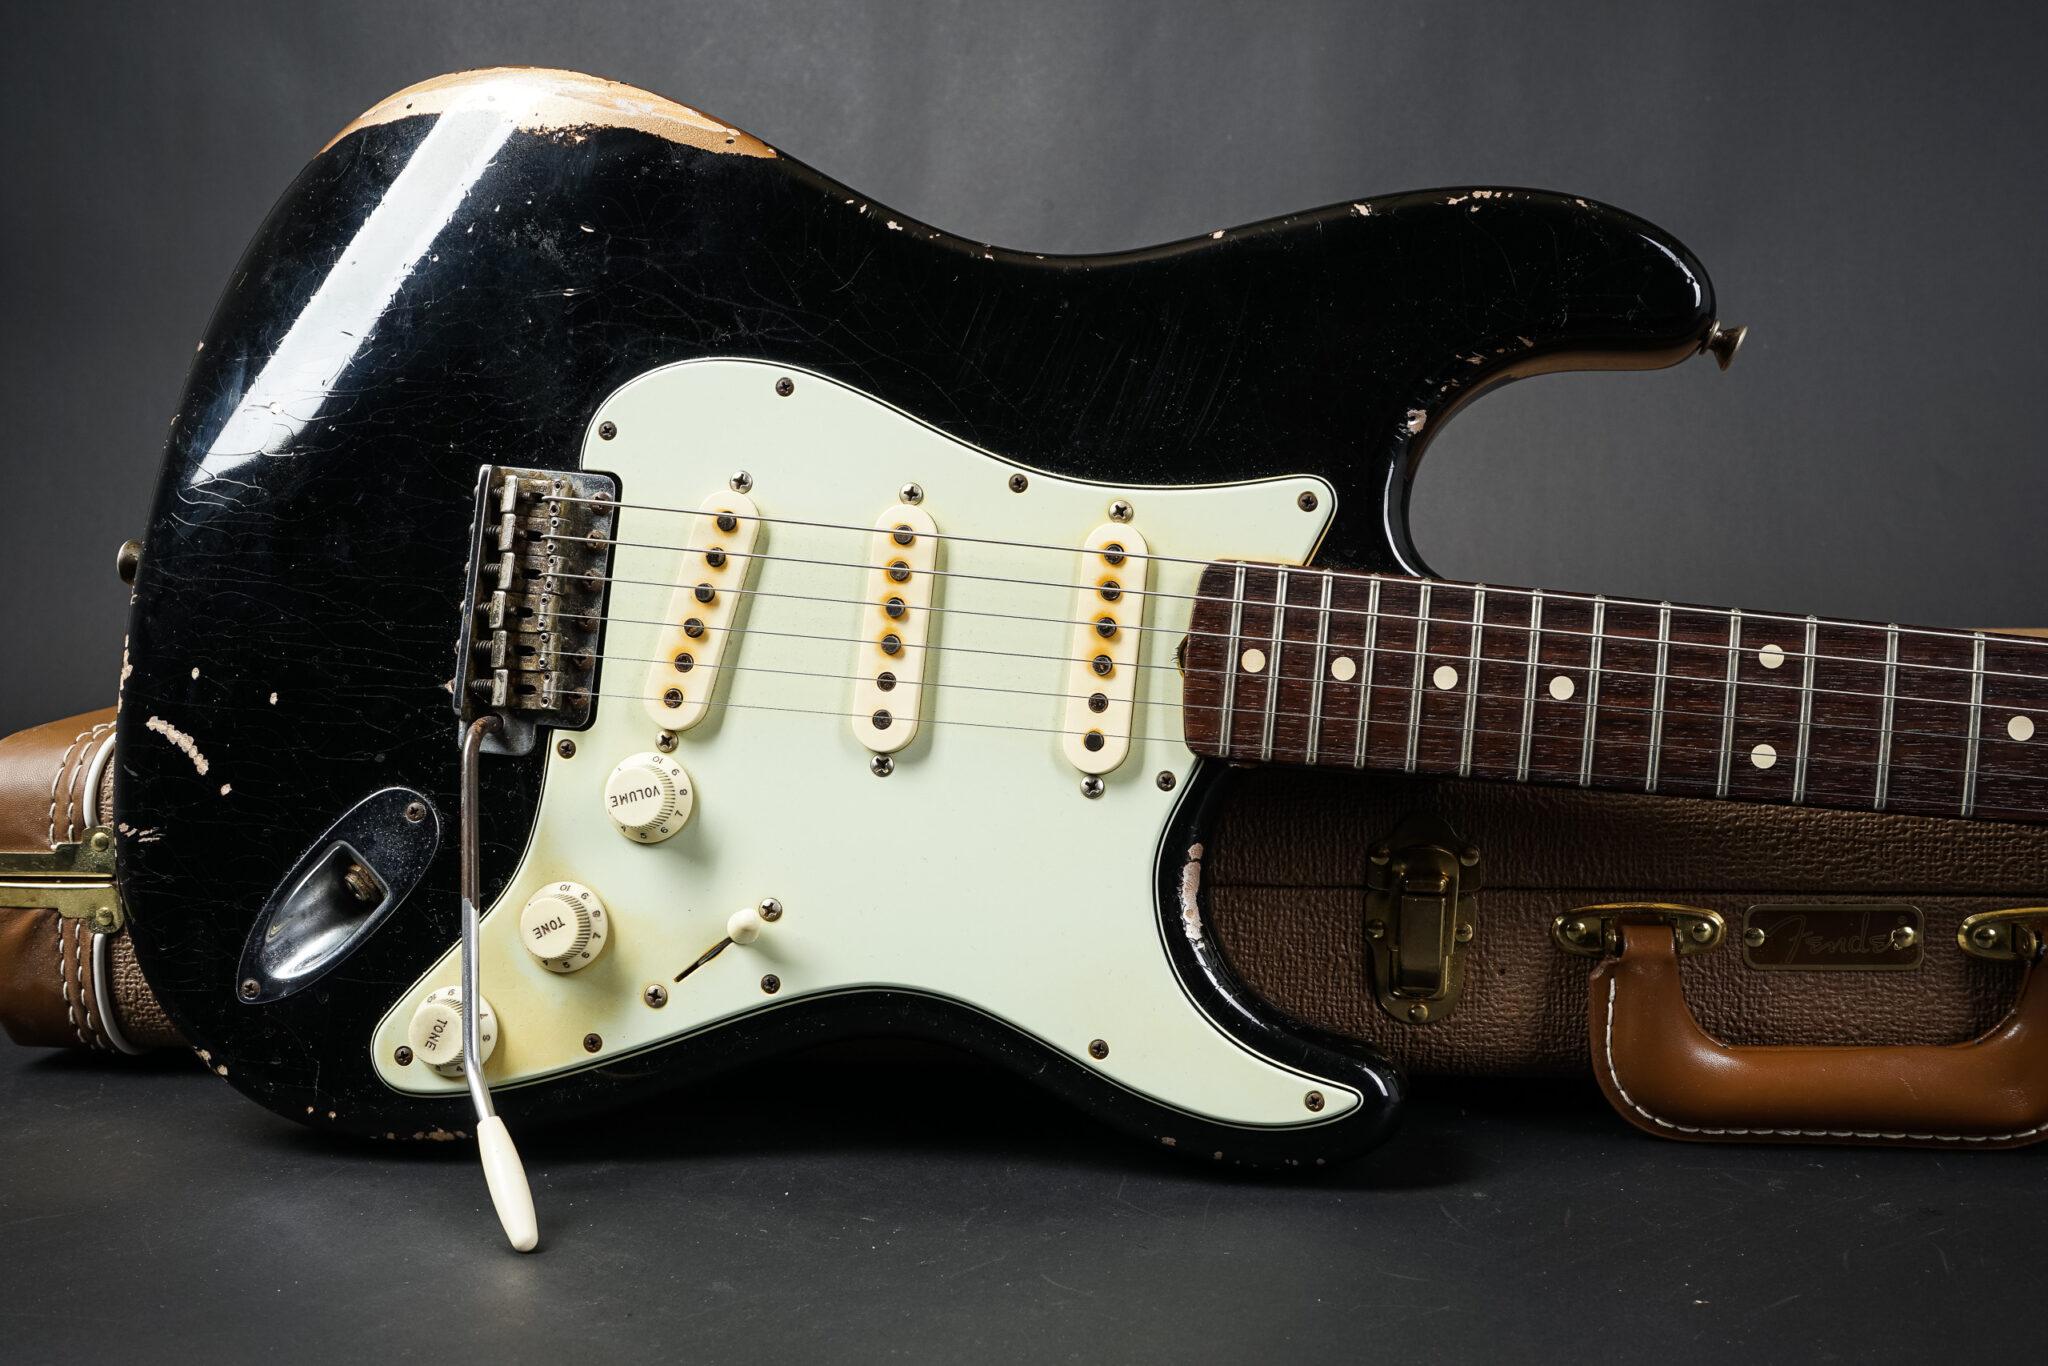 https://guitarpoint.de/app/uploads/products/2015-fender-john-cruz-masterbuilt-1960-stratocaster-relic/2015-Fender-John-Cruz-Masterbuilt-Stratocaster-Black-JC2772-10-2048x1366.jpg